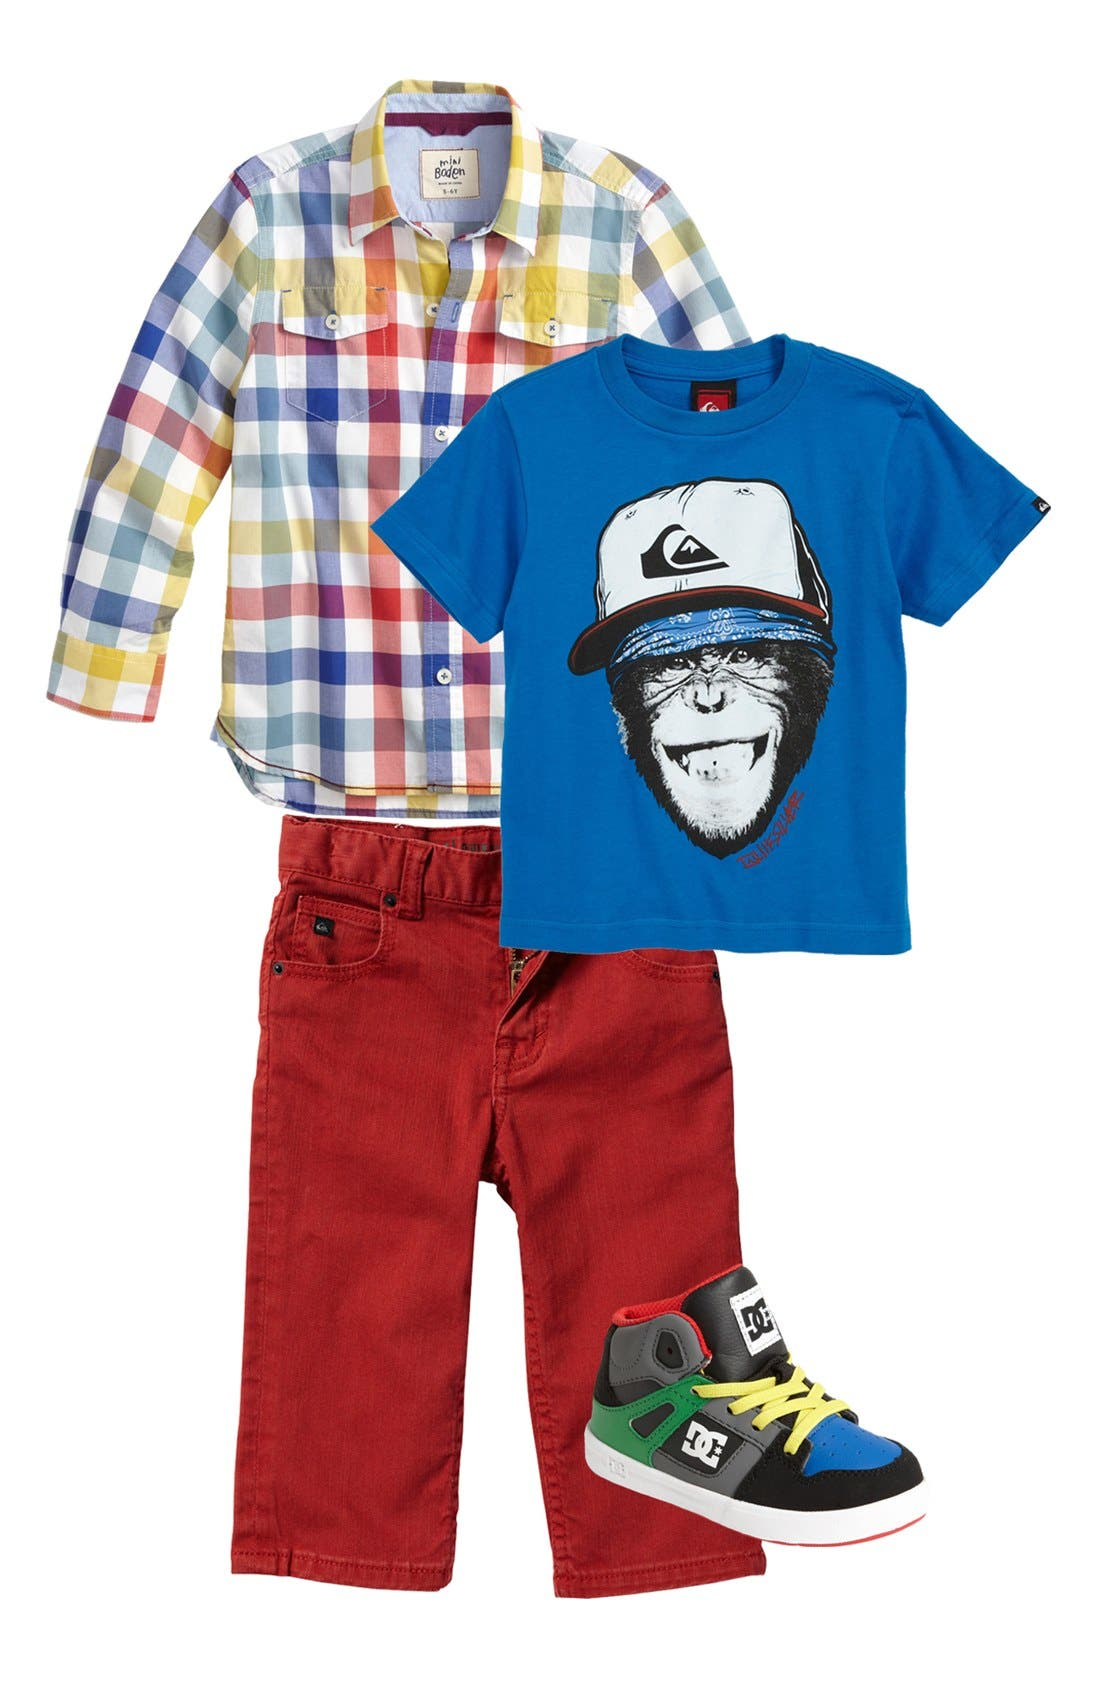 Alternate Image 1 Selected - Mini Boden Woven Shirt & Quiksilver T-Shirt & Jeans (Toddler)